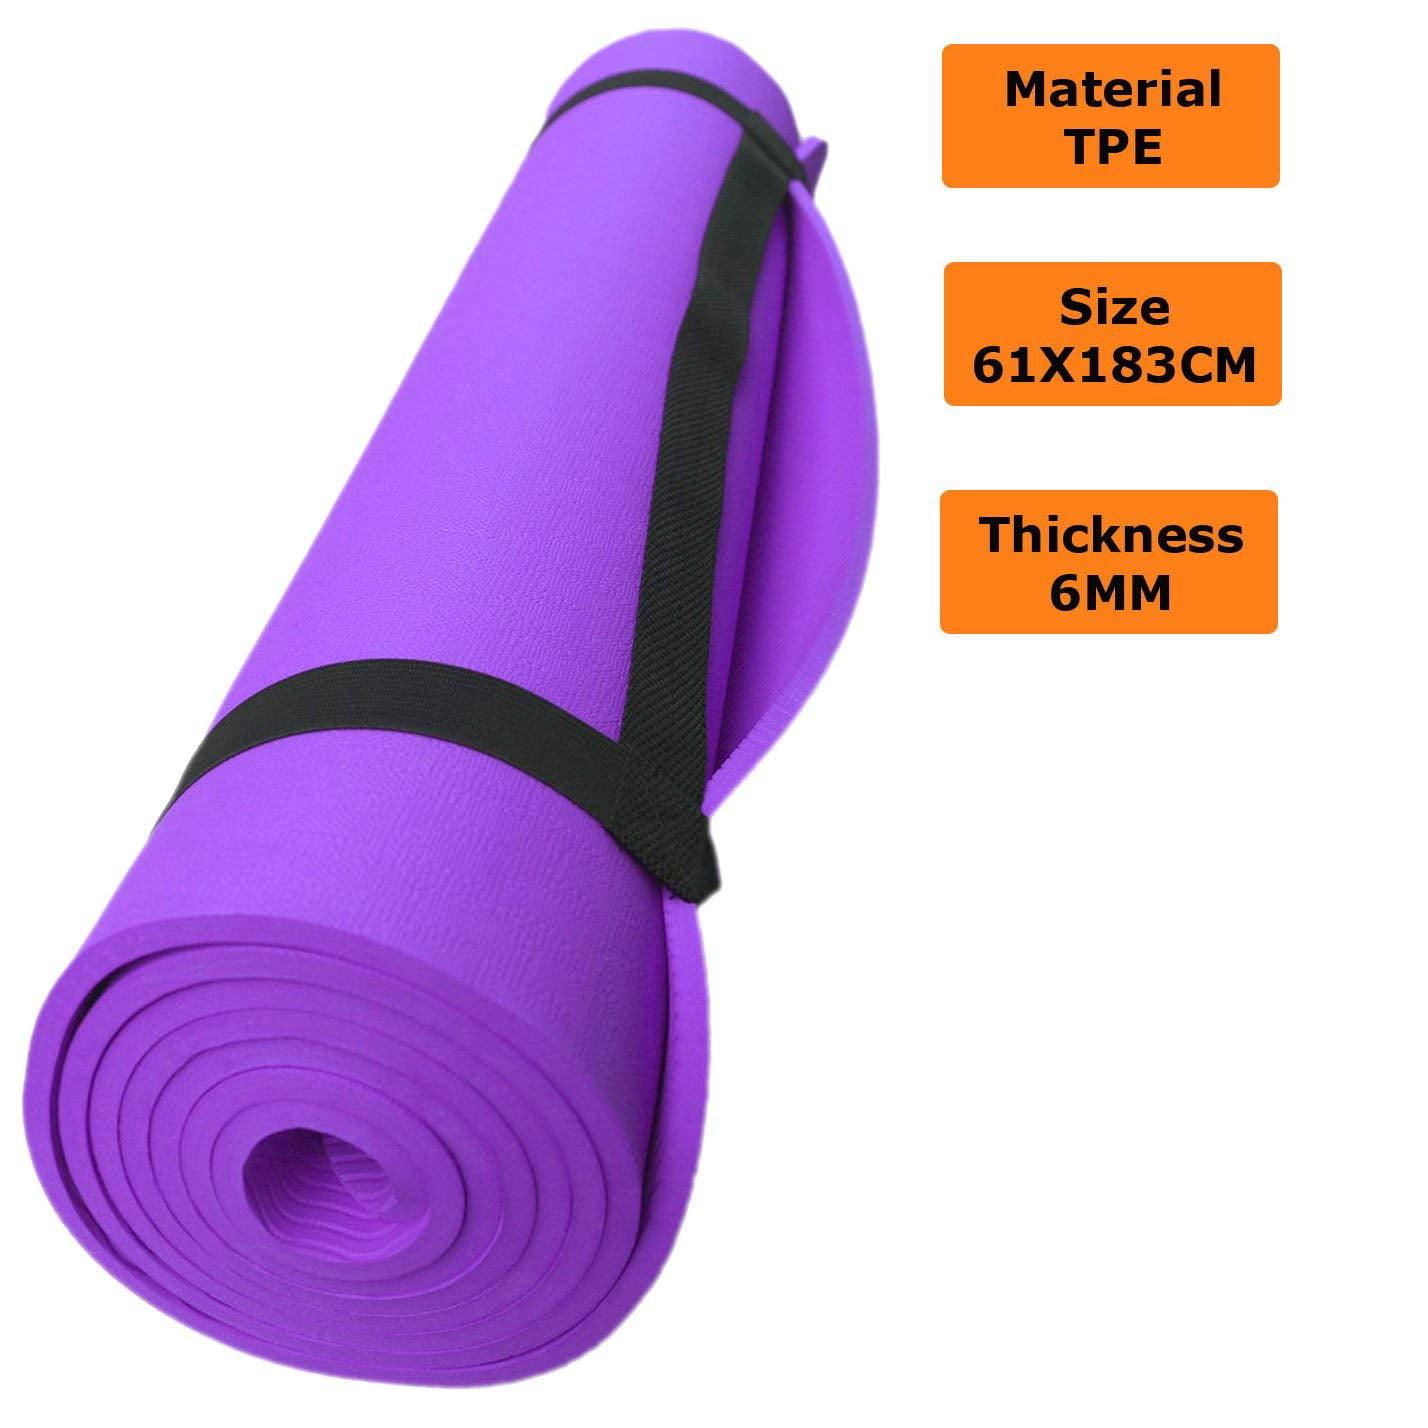 b8a25c4c42 Yoga Accessories & Pilates Equipment | Walmart Canada